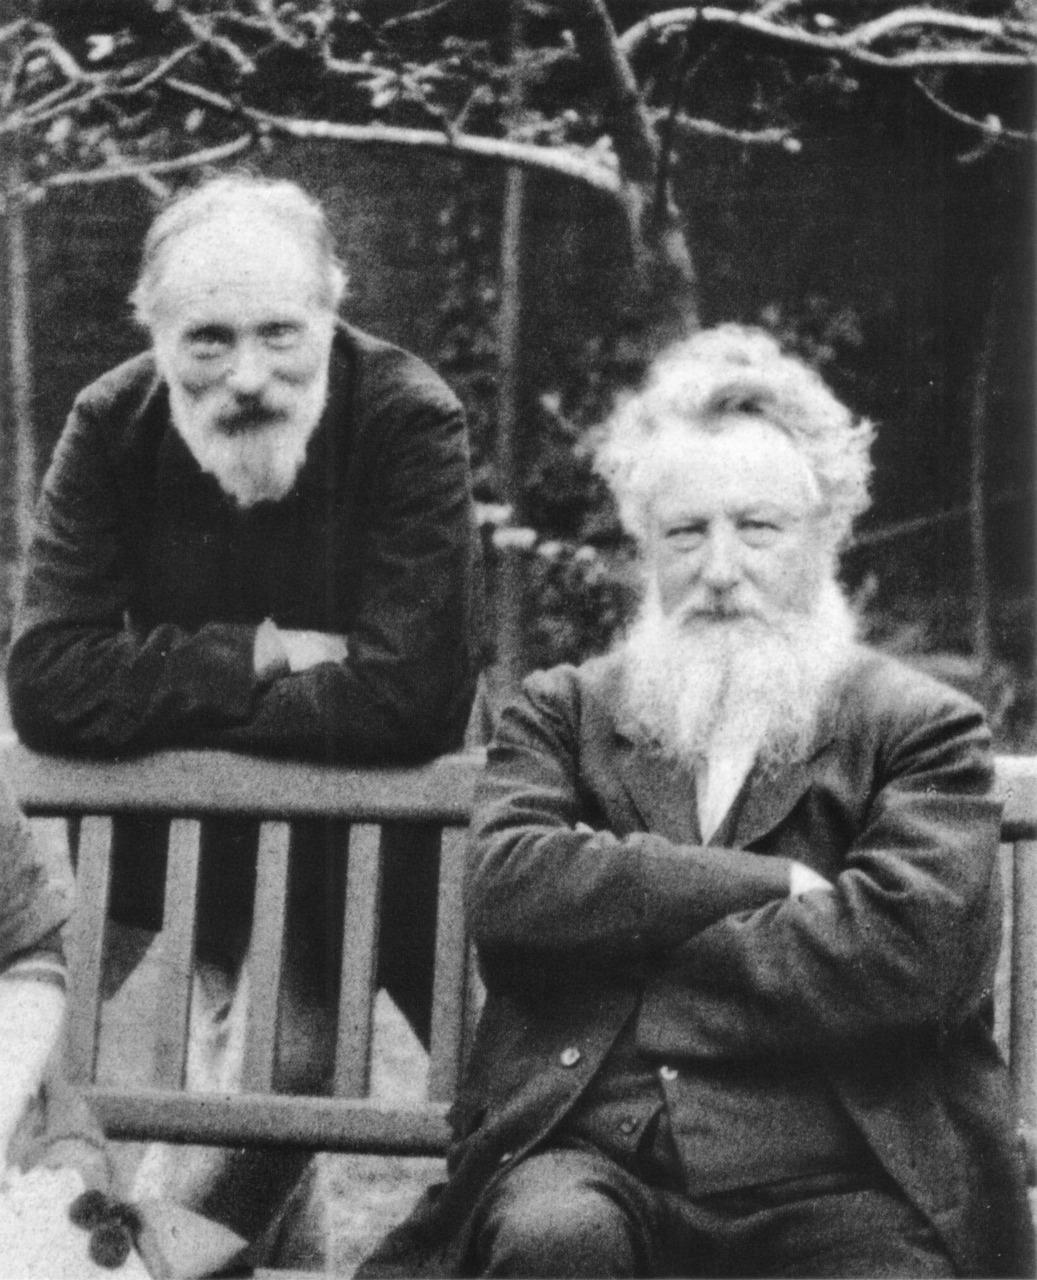 artists-William-Morris-and-Edward-Burne-Jones-wallpaper-wp4404606